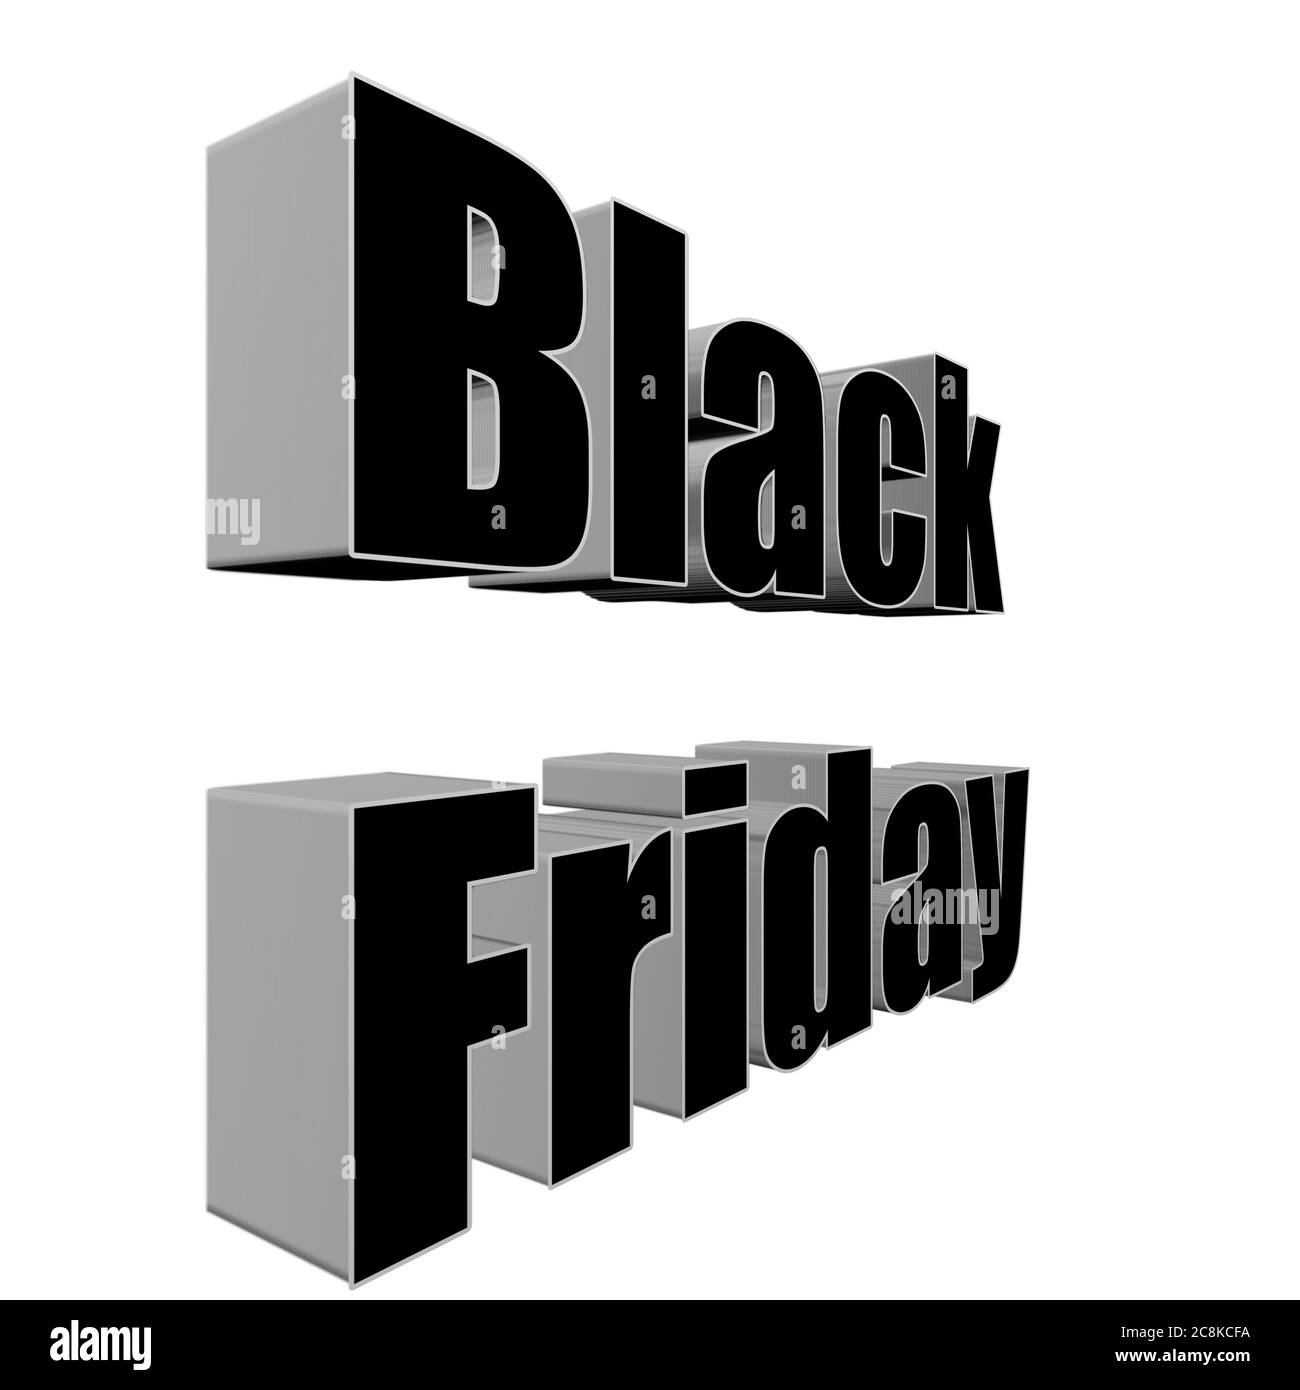 Black Friday 3d Illustration Black Friday Name 3d Rendering Black Friday 3d Clip Art Stock Photo Alamy